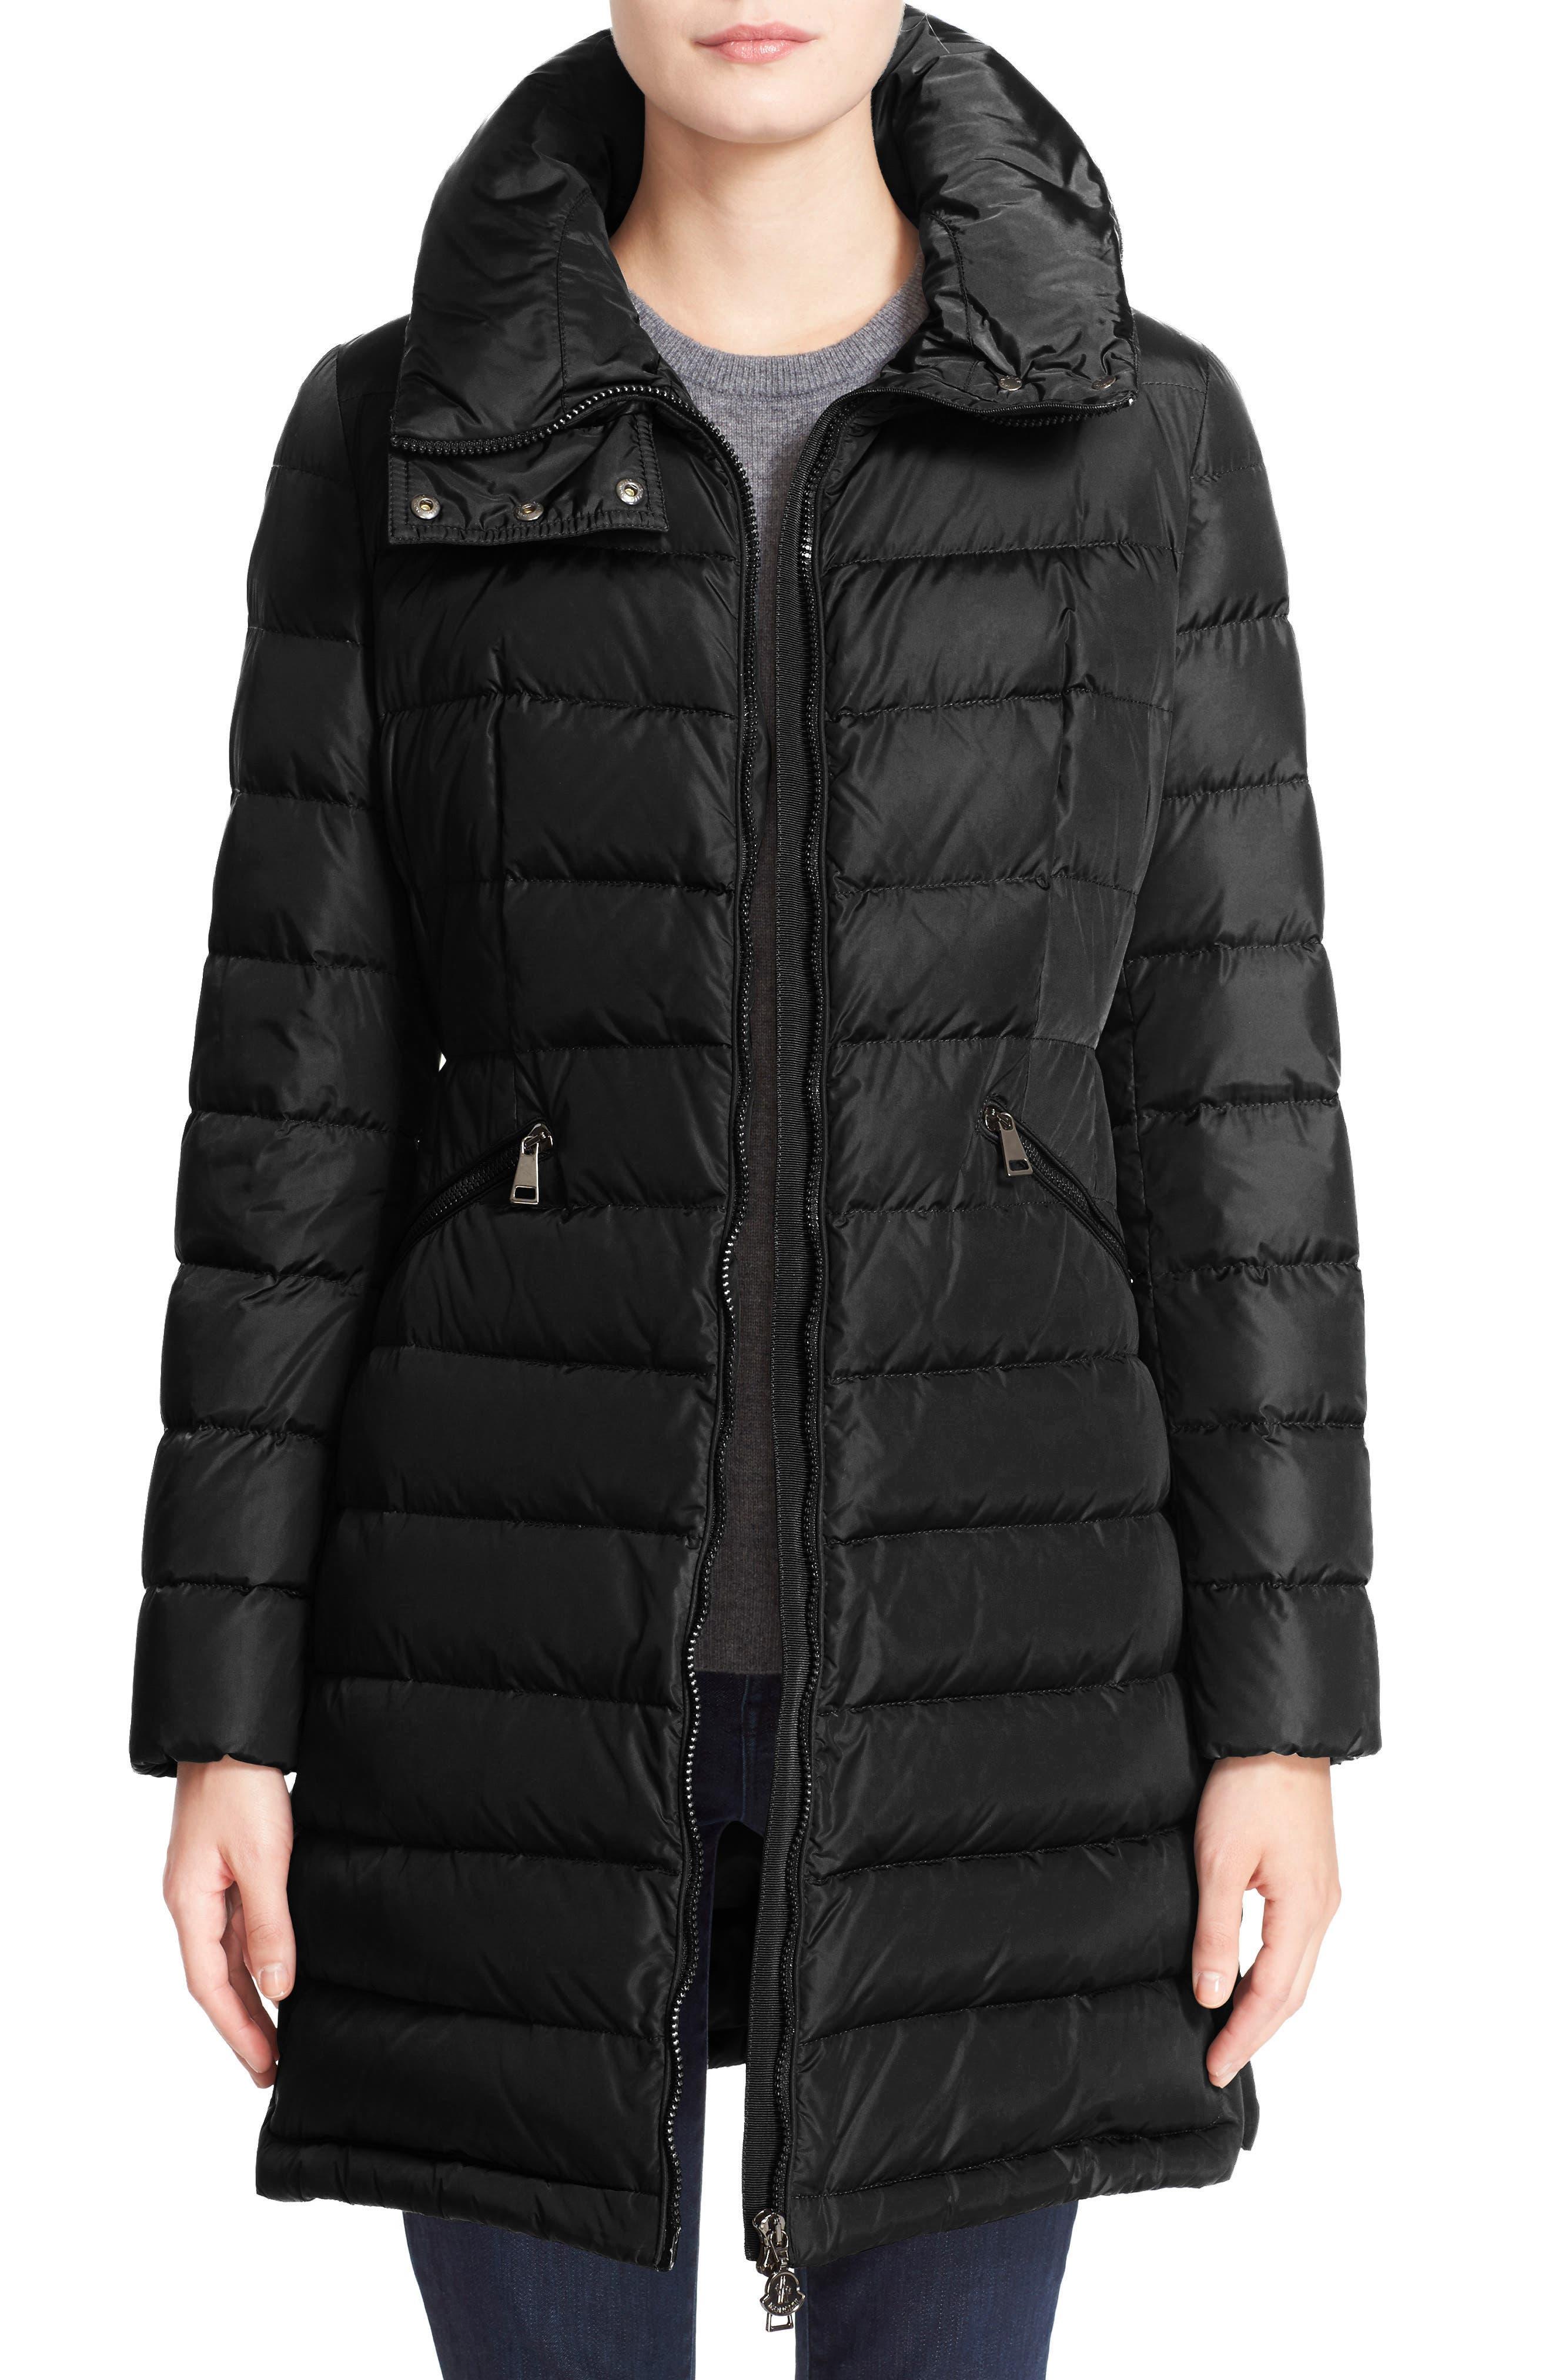 MONCLER 'Flammette' Water Resistant Long Hooded Down Coat, Main, color, BLACK